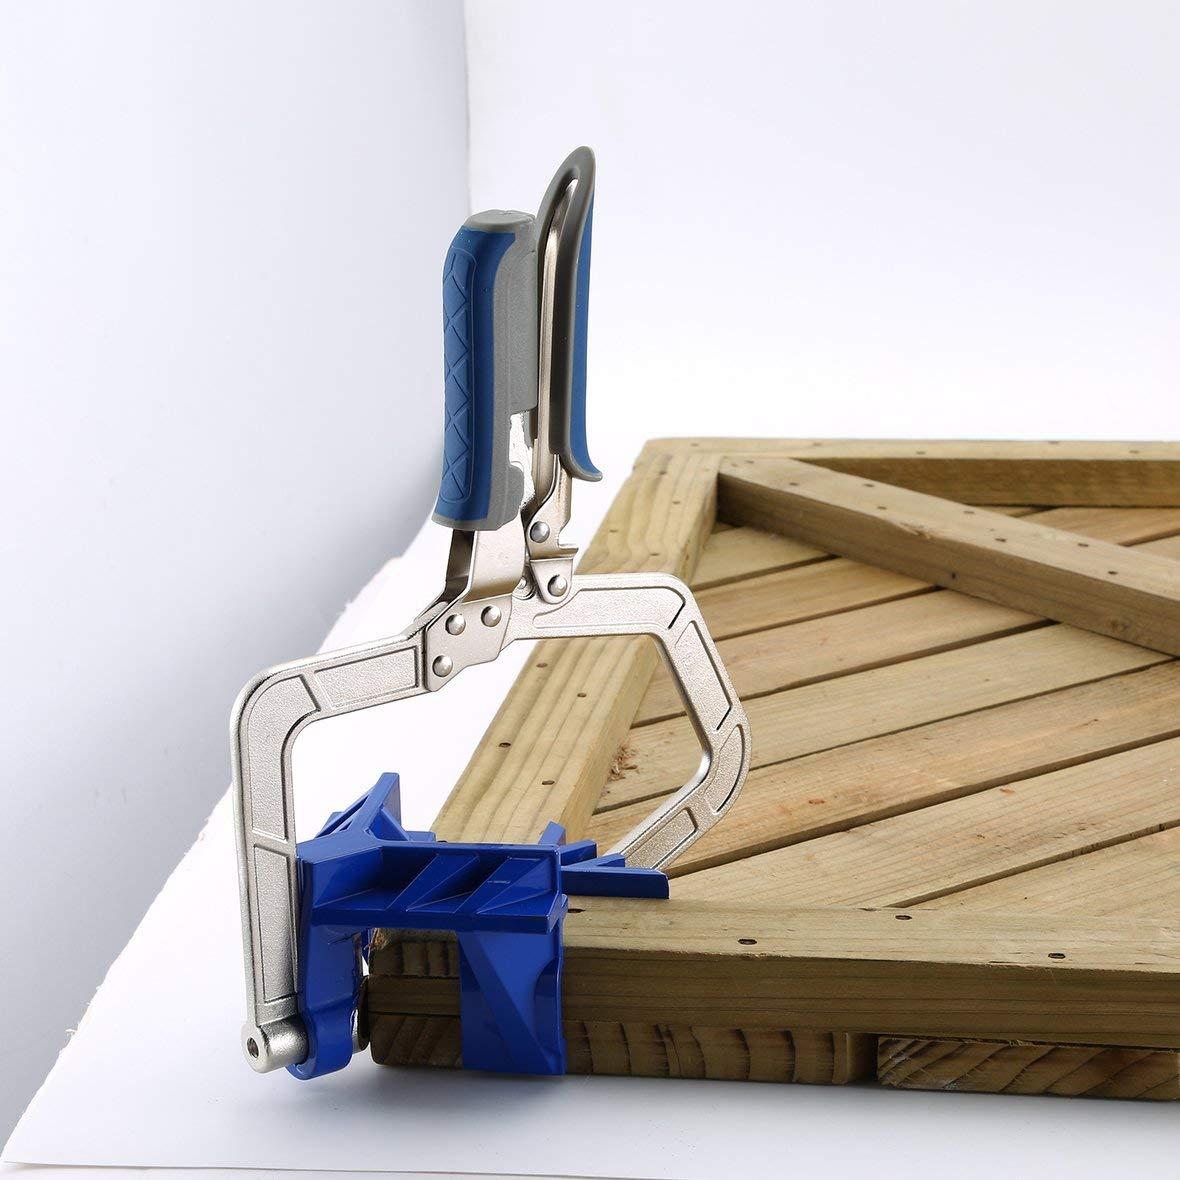 90 Grad rechtwinklig feste Stanzmaschine Eckspanner Gehrungslehre Holzbearbeitungswerkzeug T-Verbindungen KHCCC F/ür Kreg Jigs-Blue